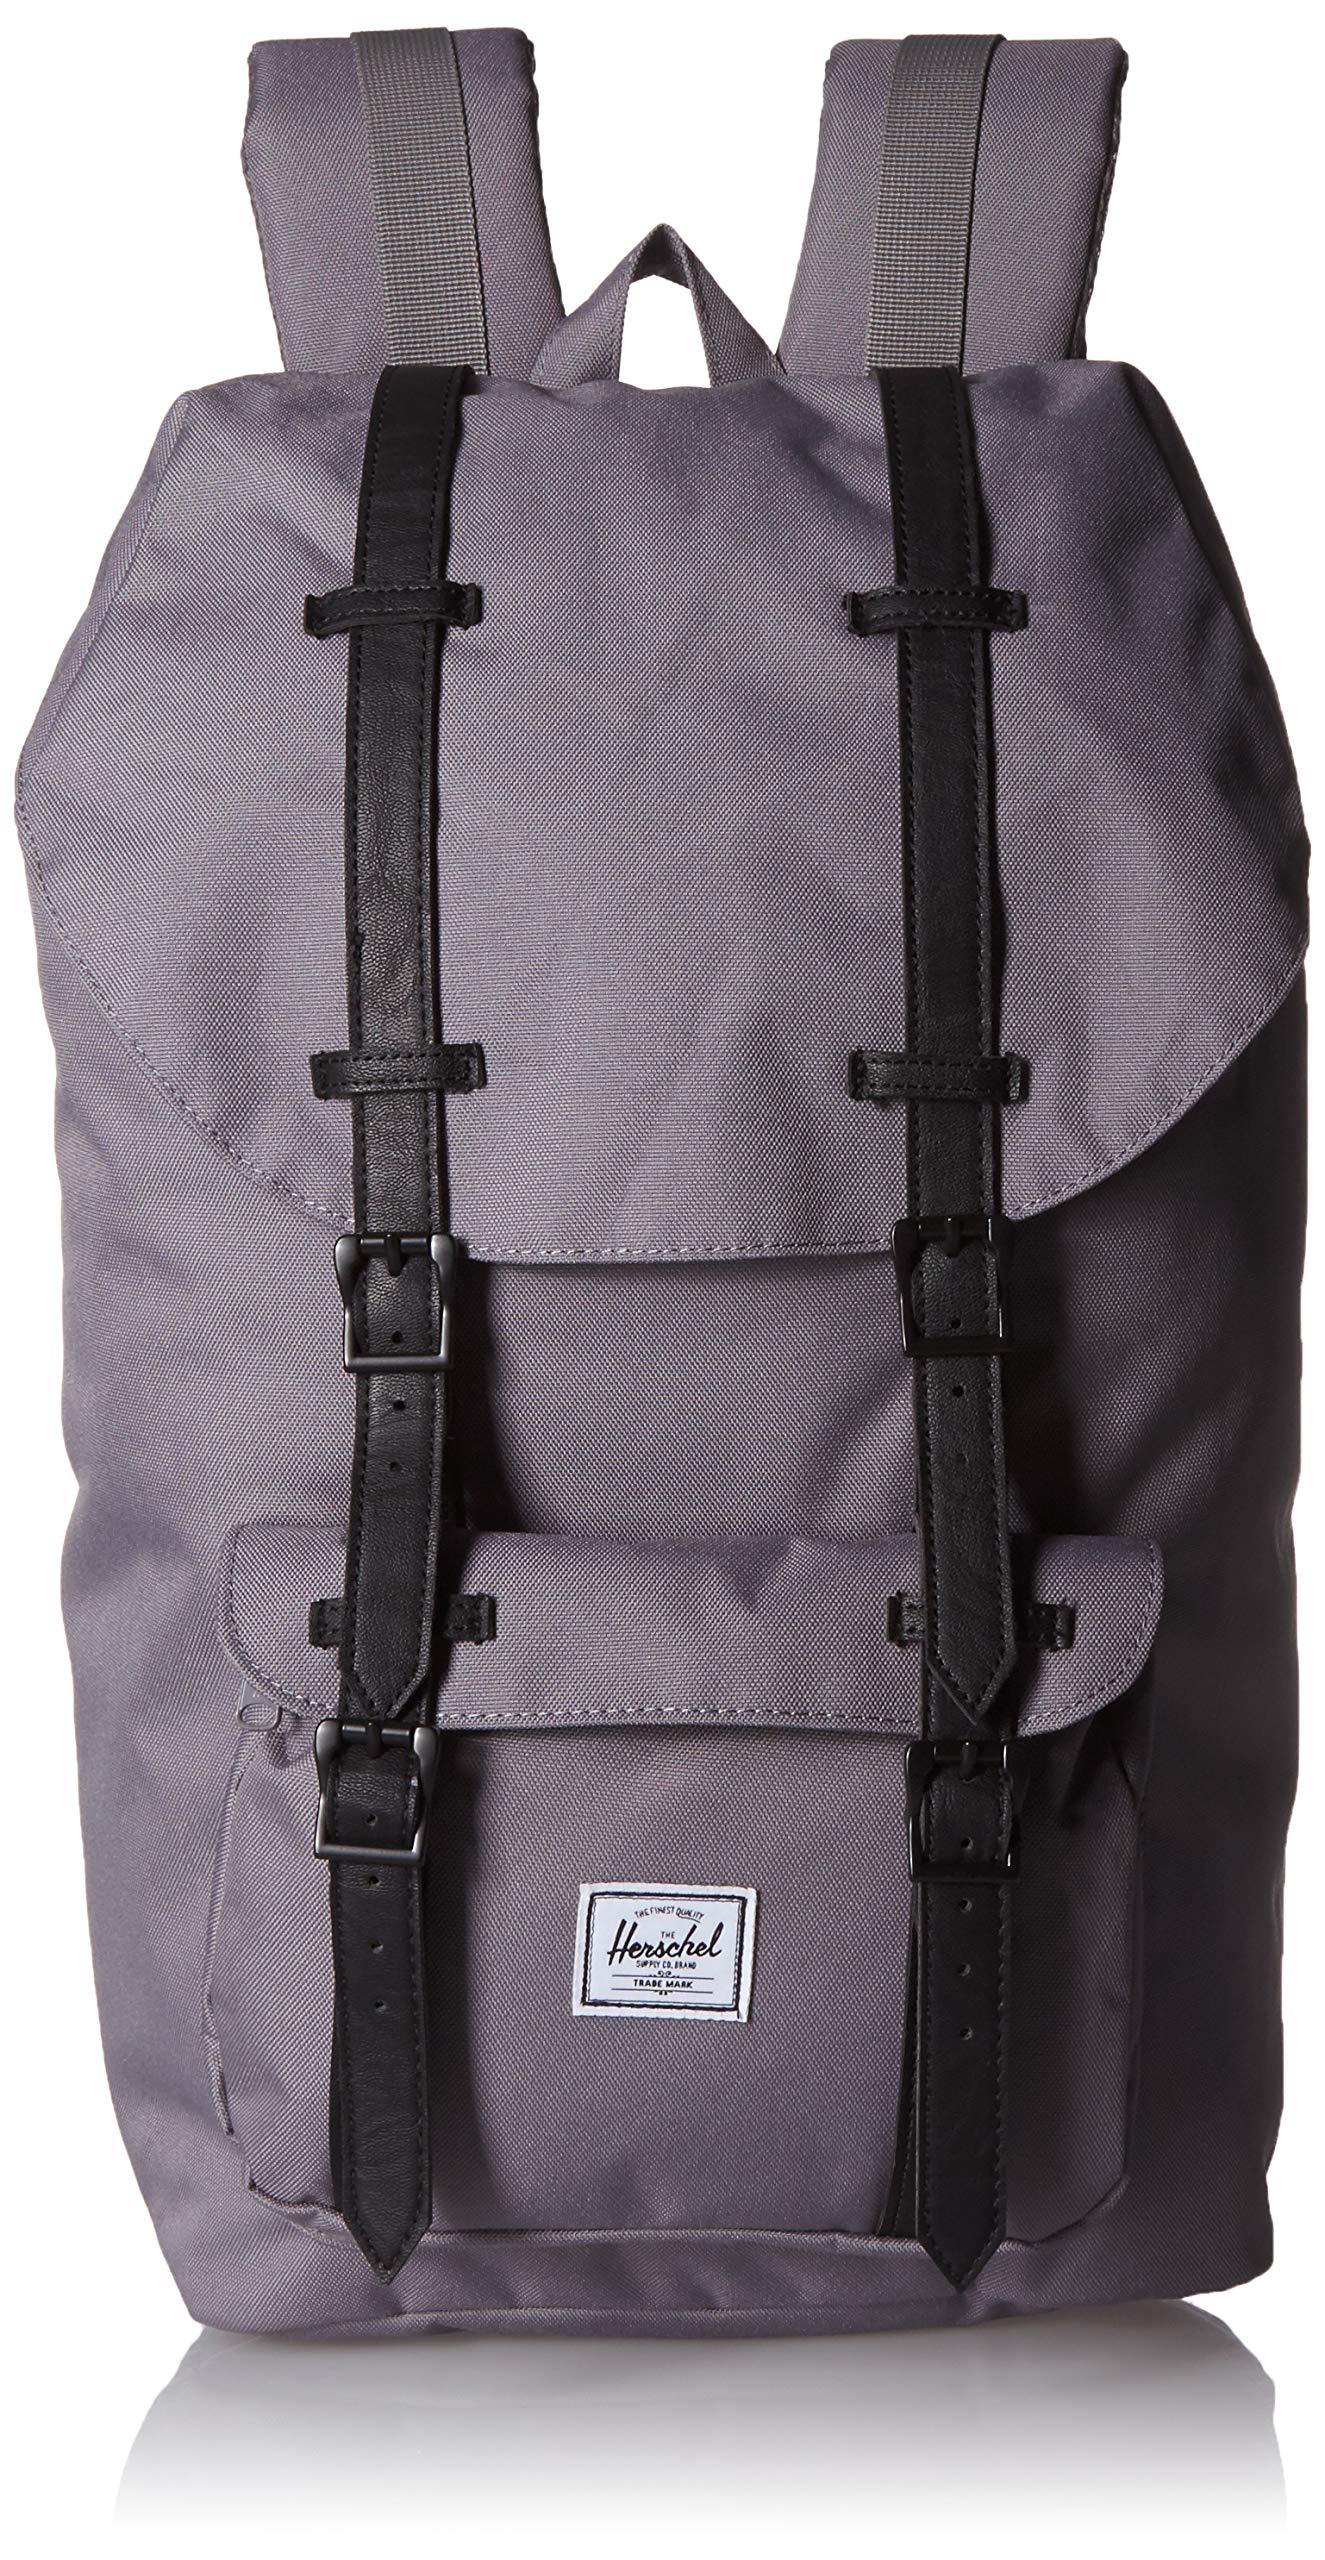 Herschel Little America Backpack, Grey/Black, One